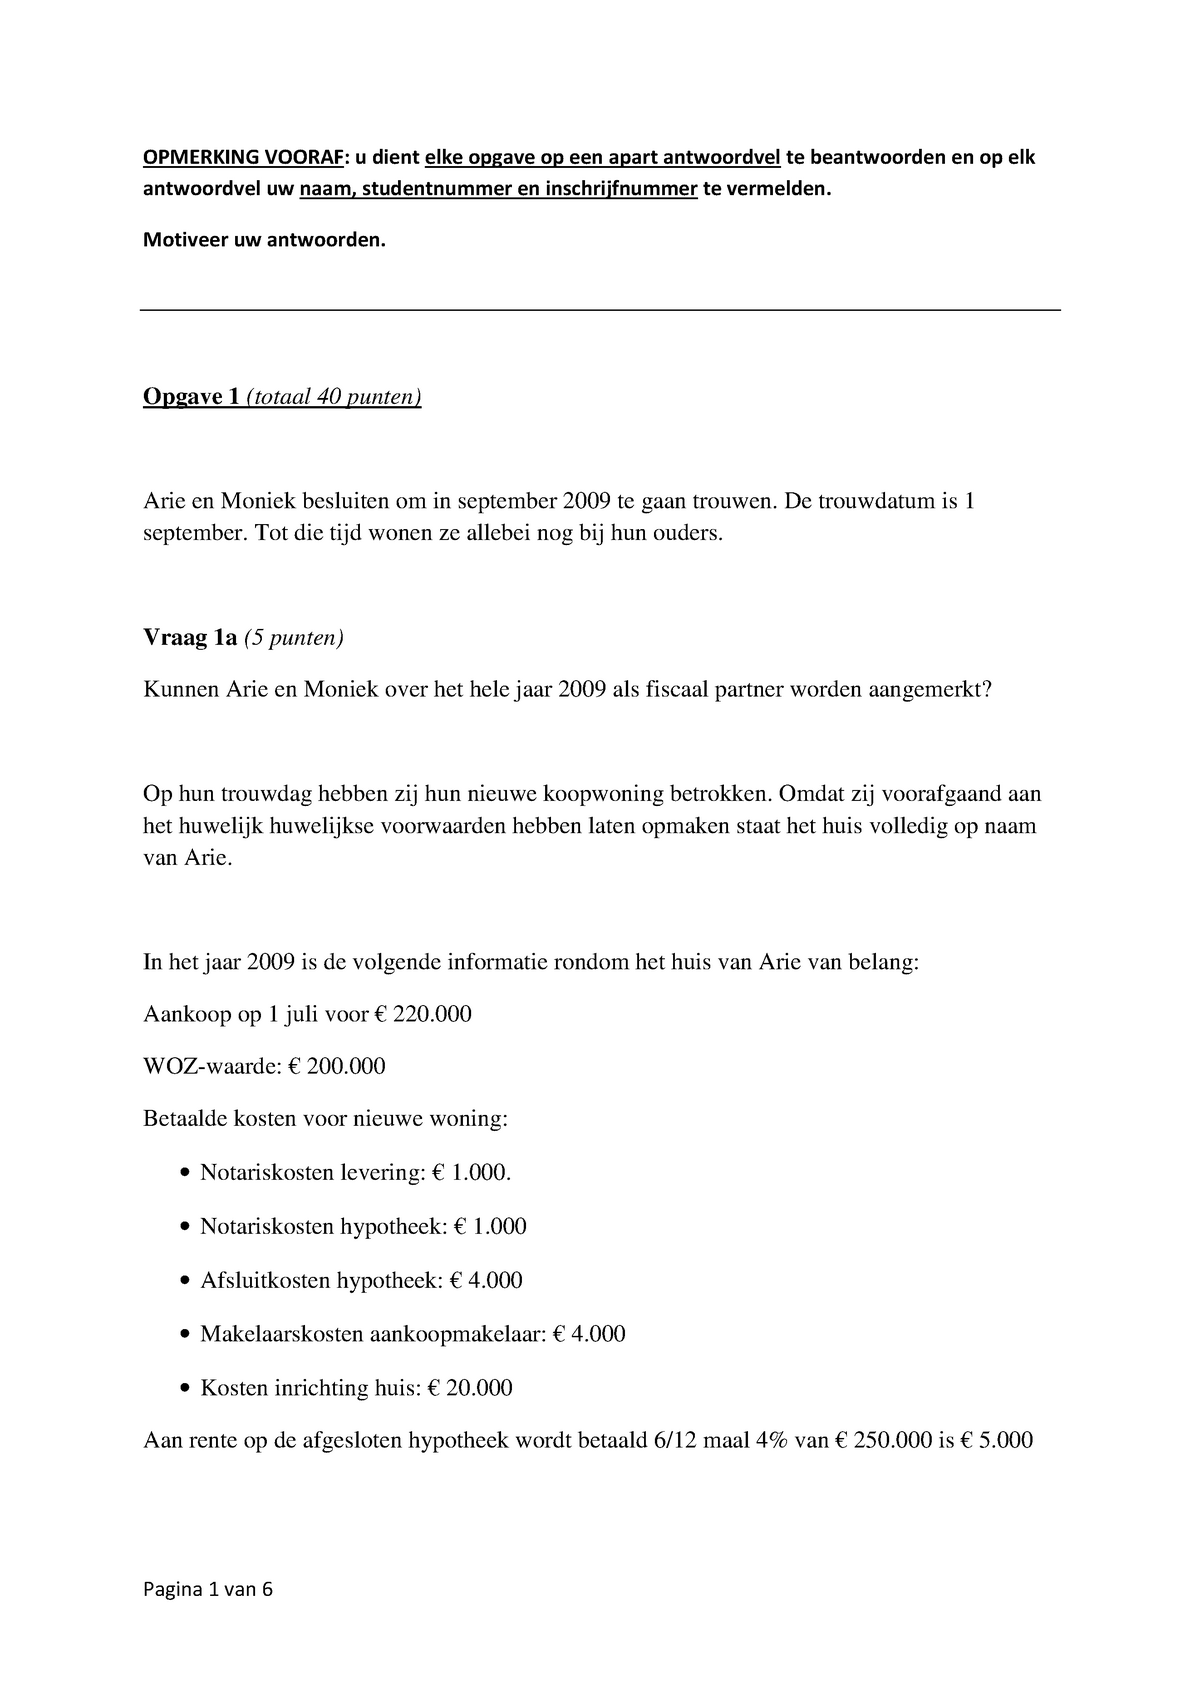 Tentamen 2011 Jur 3inkbenota Inkomstenbelasting